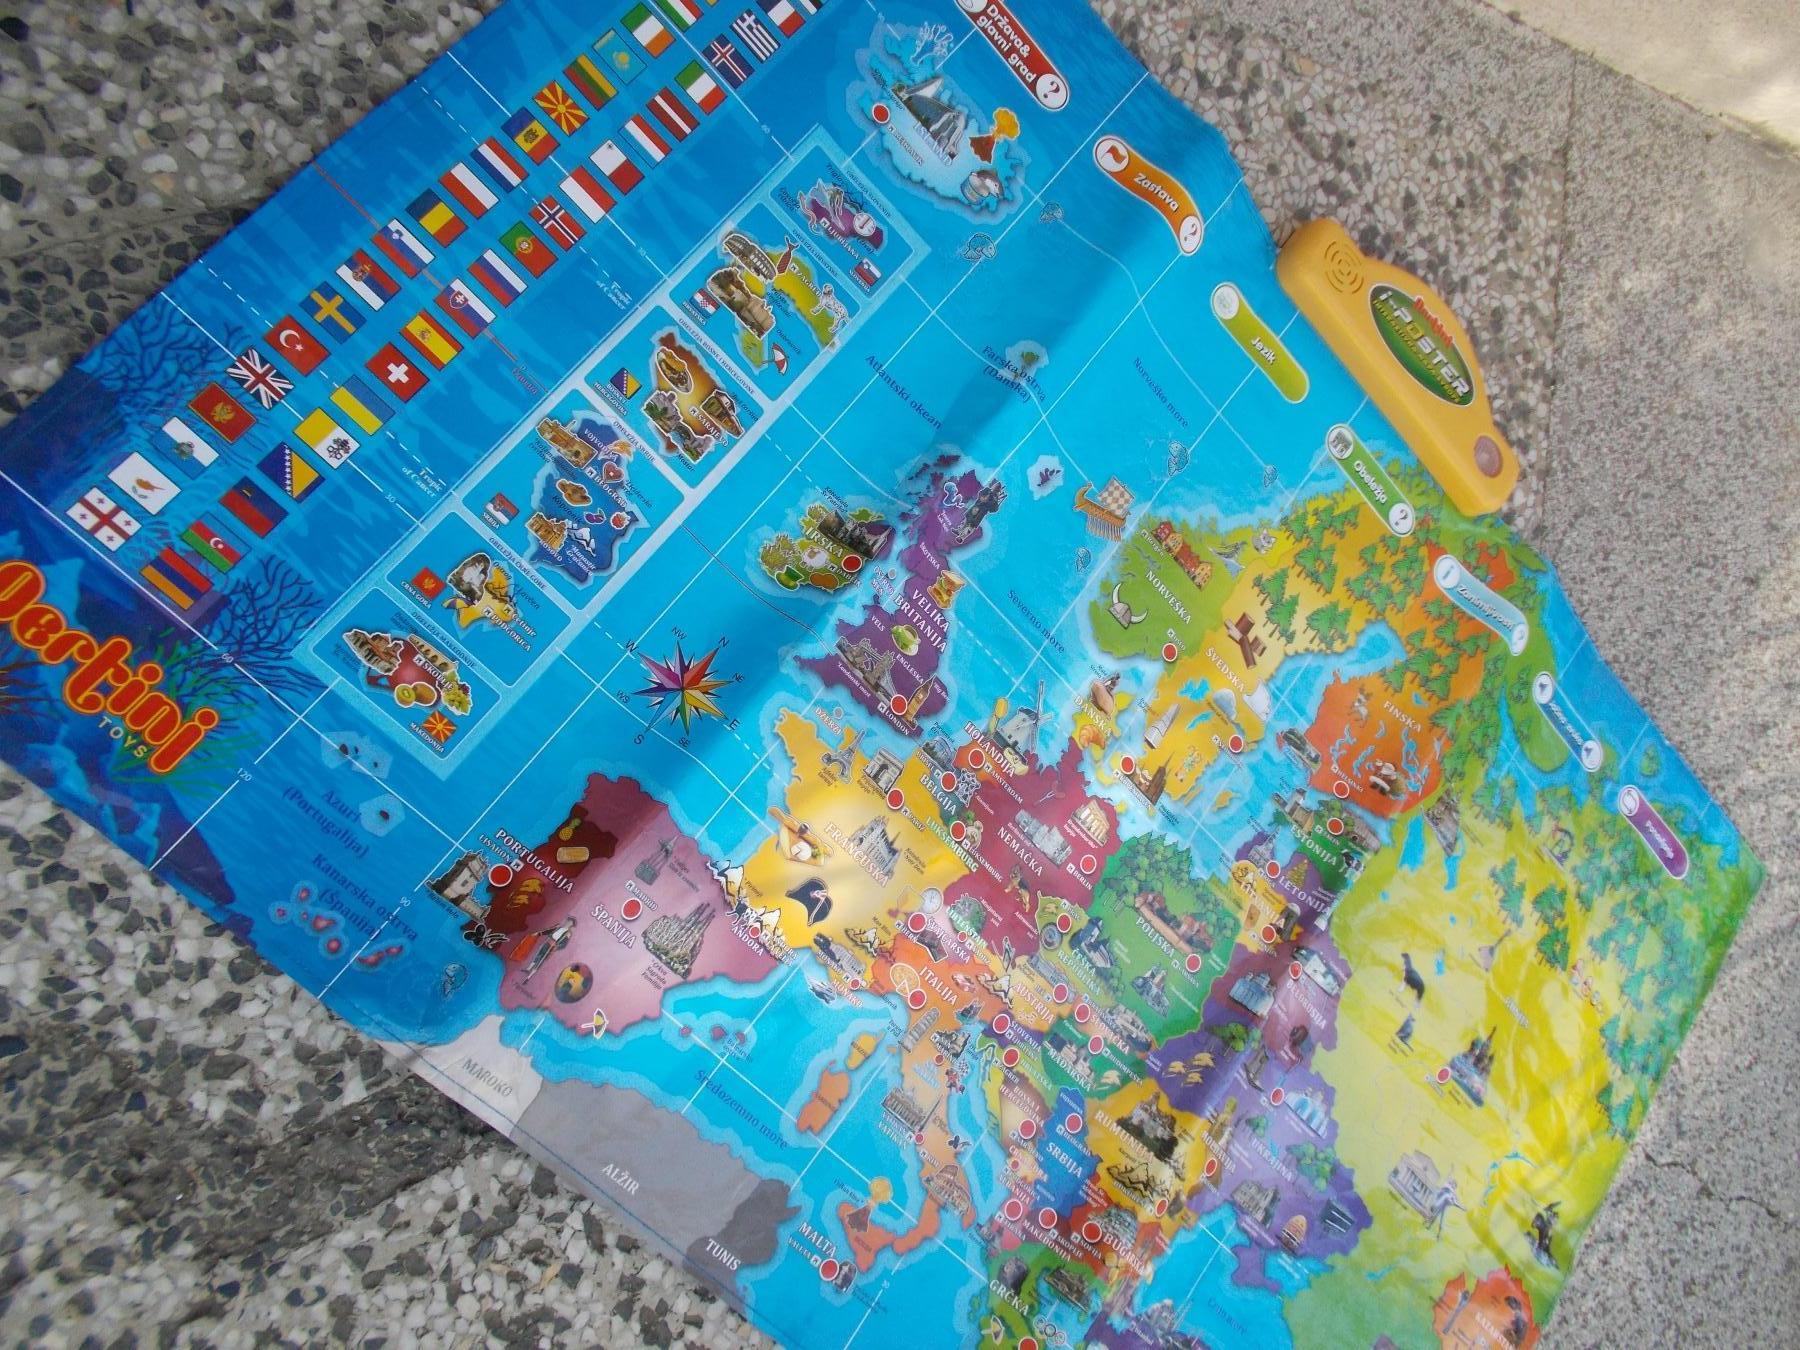 Pertini Elektronska Mapa Evrope 69346737 Limundo Com